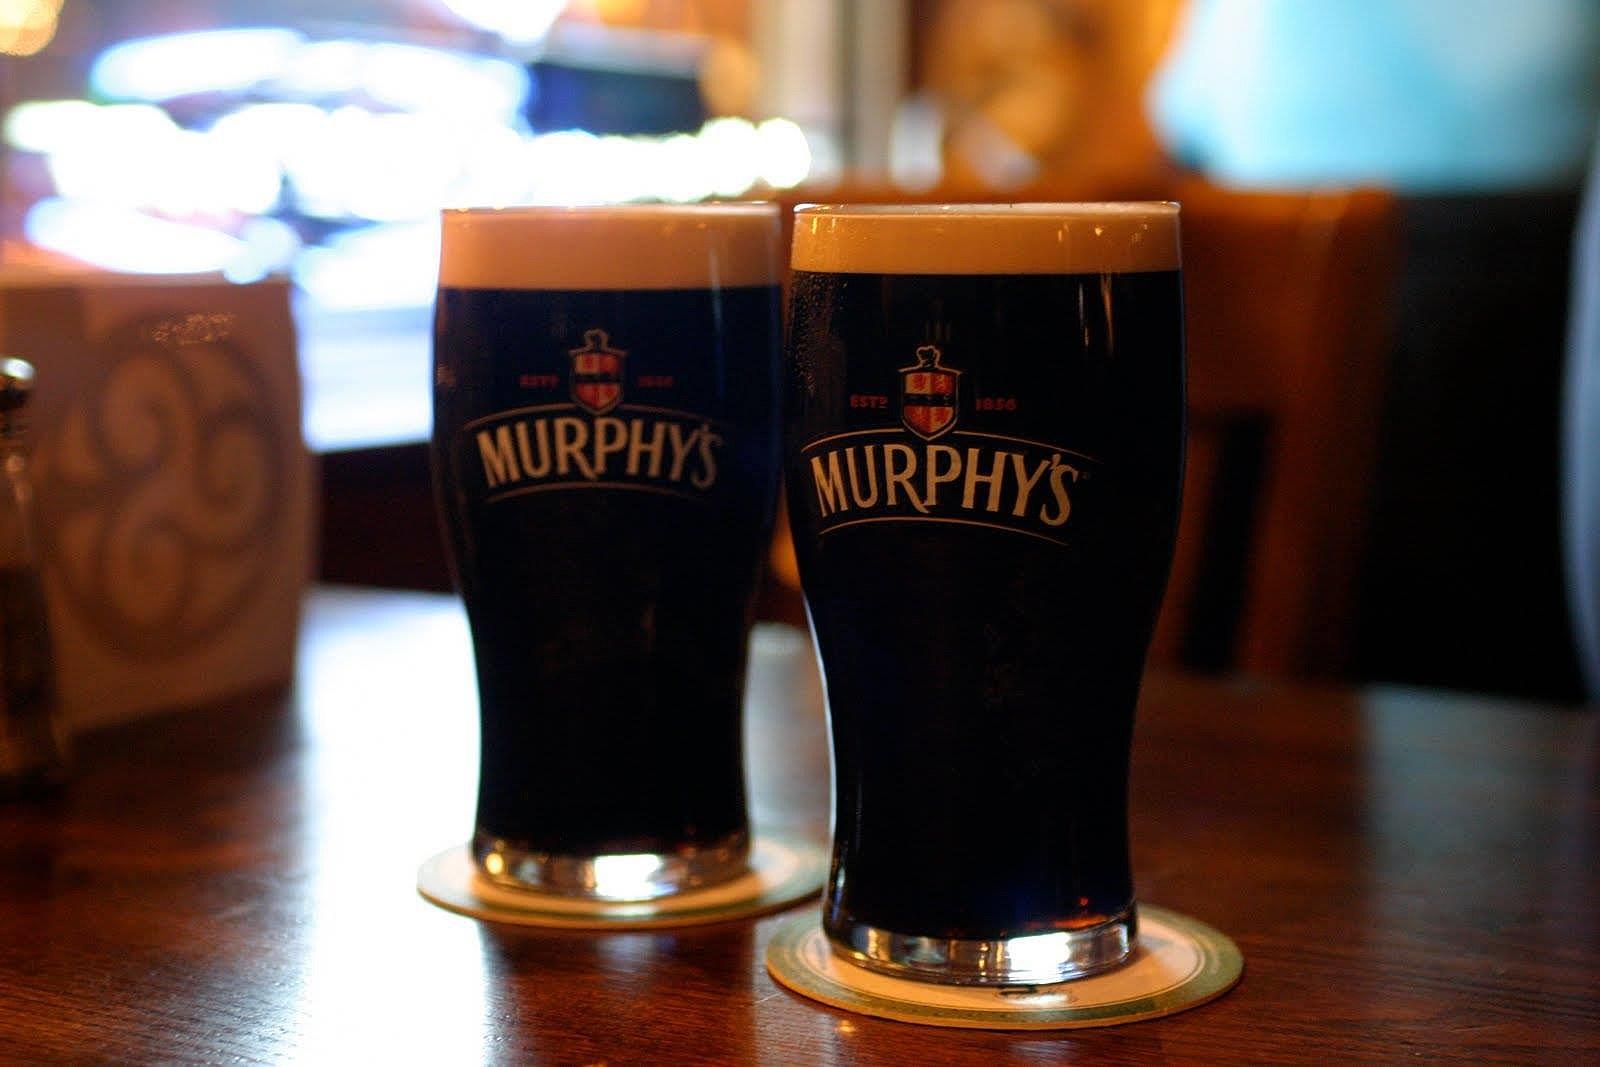 Murphy's Irish Stout/Facebook